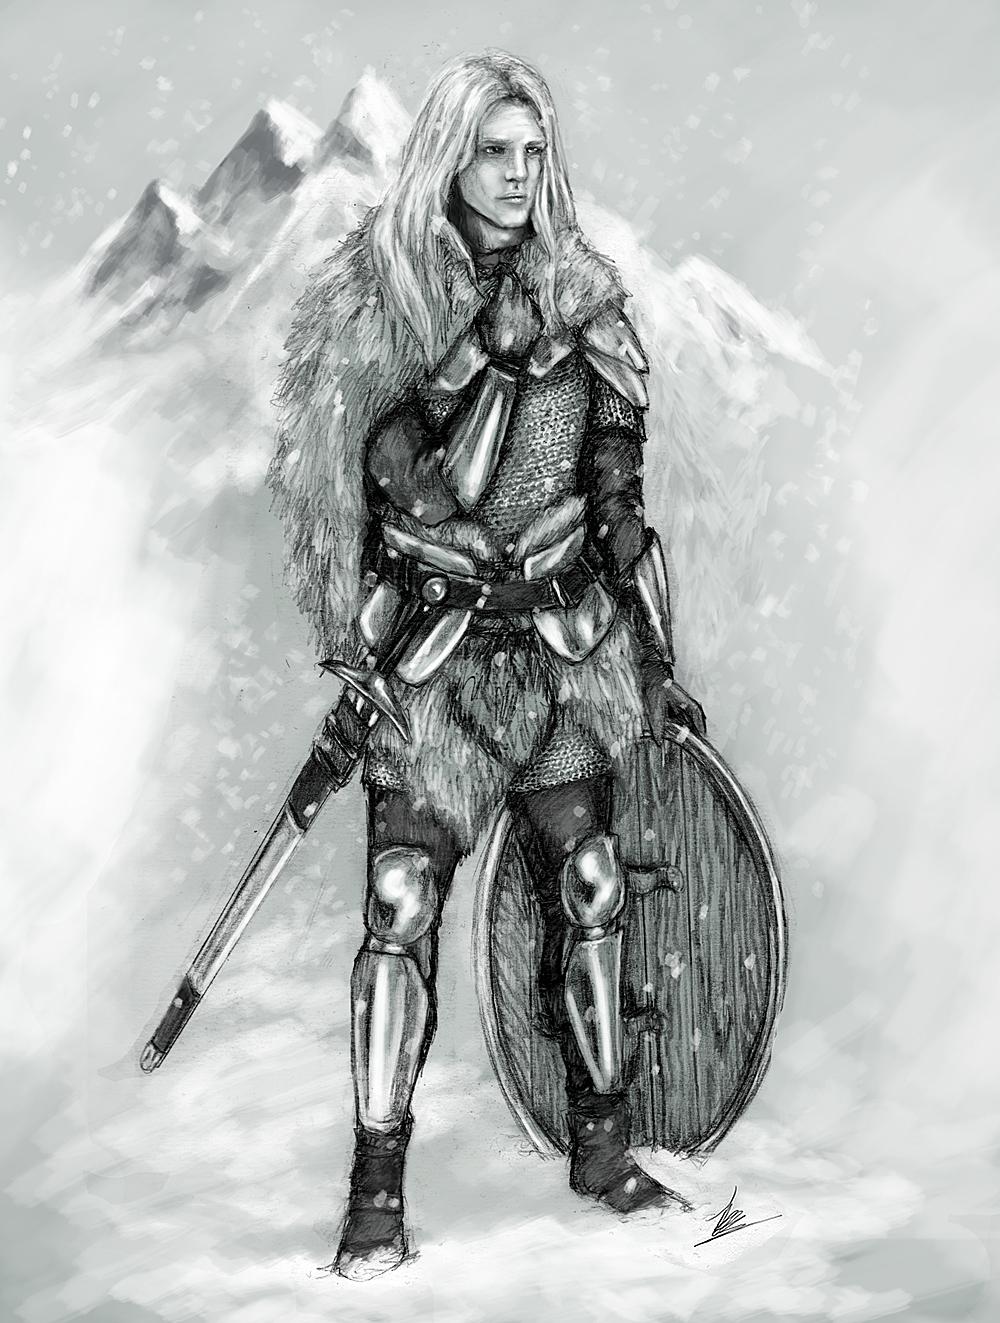 Drawn viking viking woman @deviantART  deviantart on tansy9